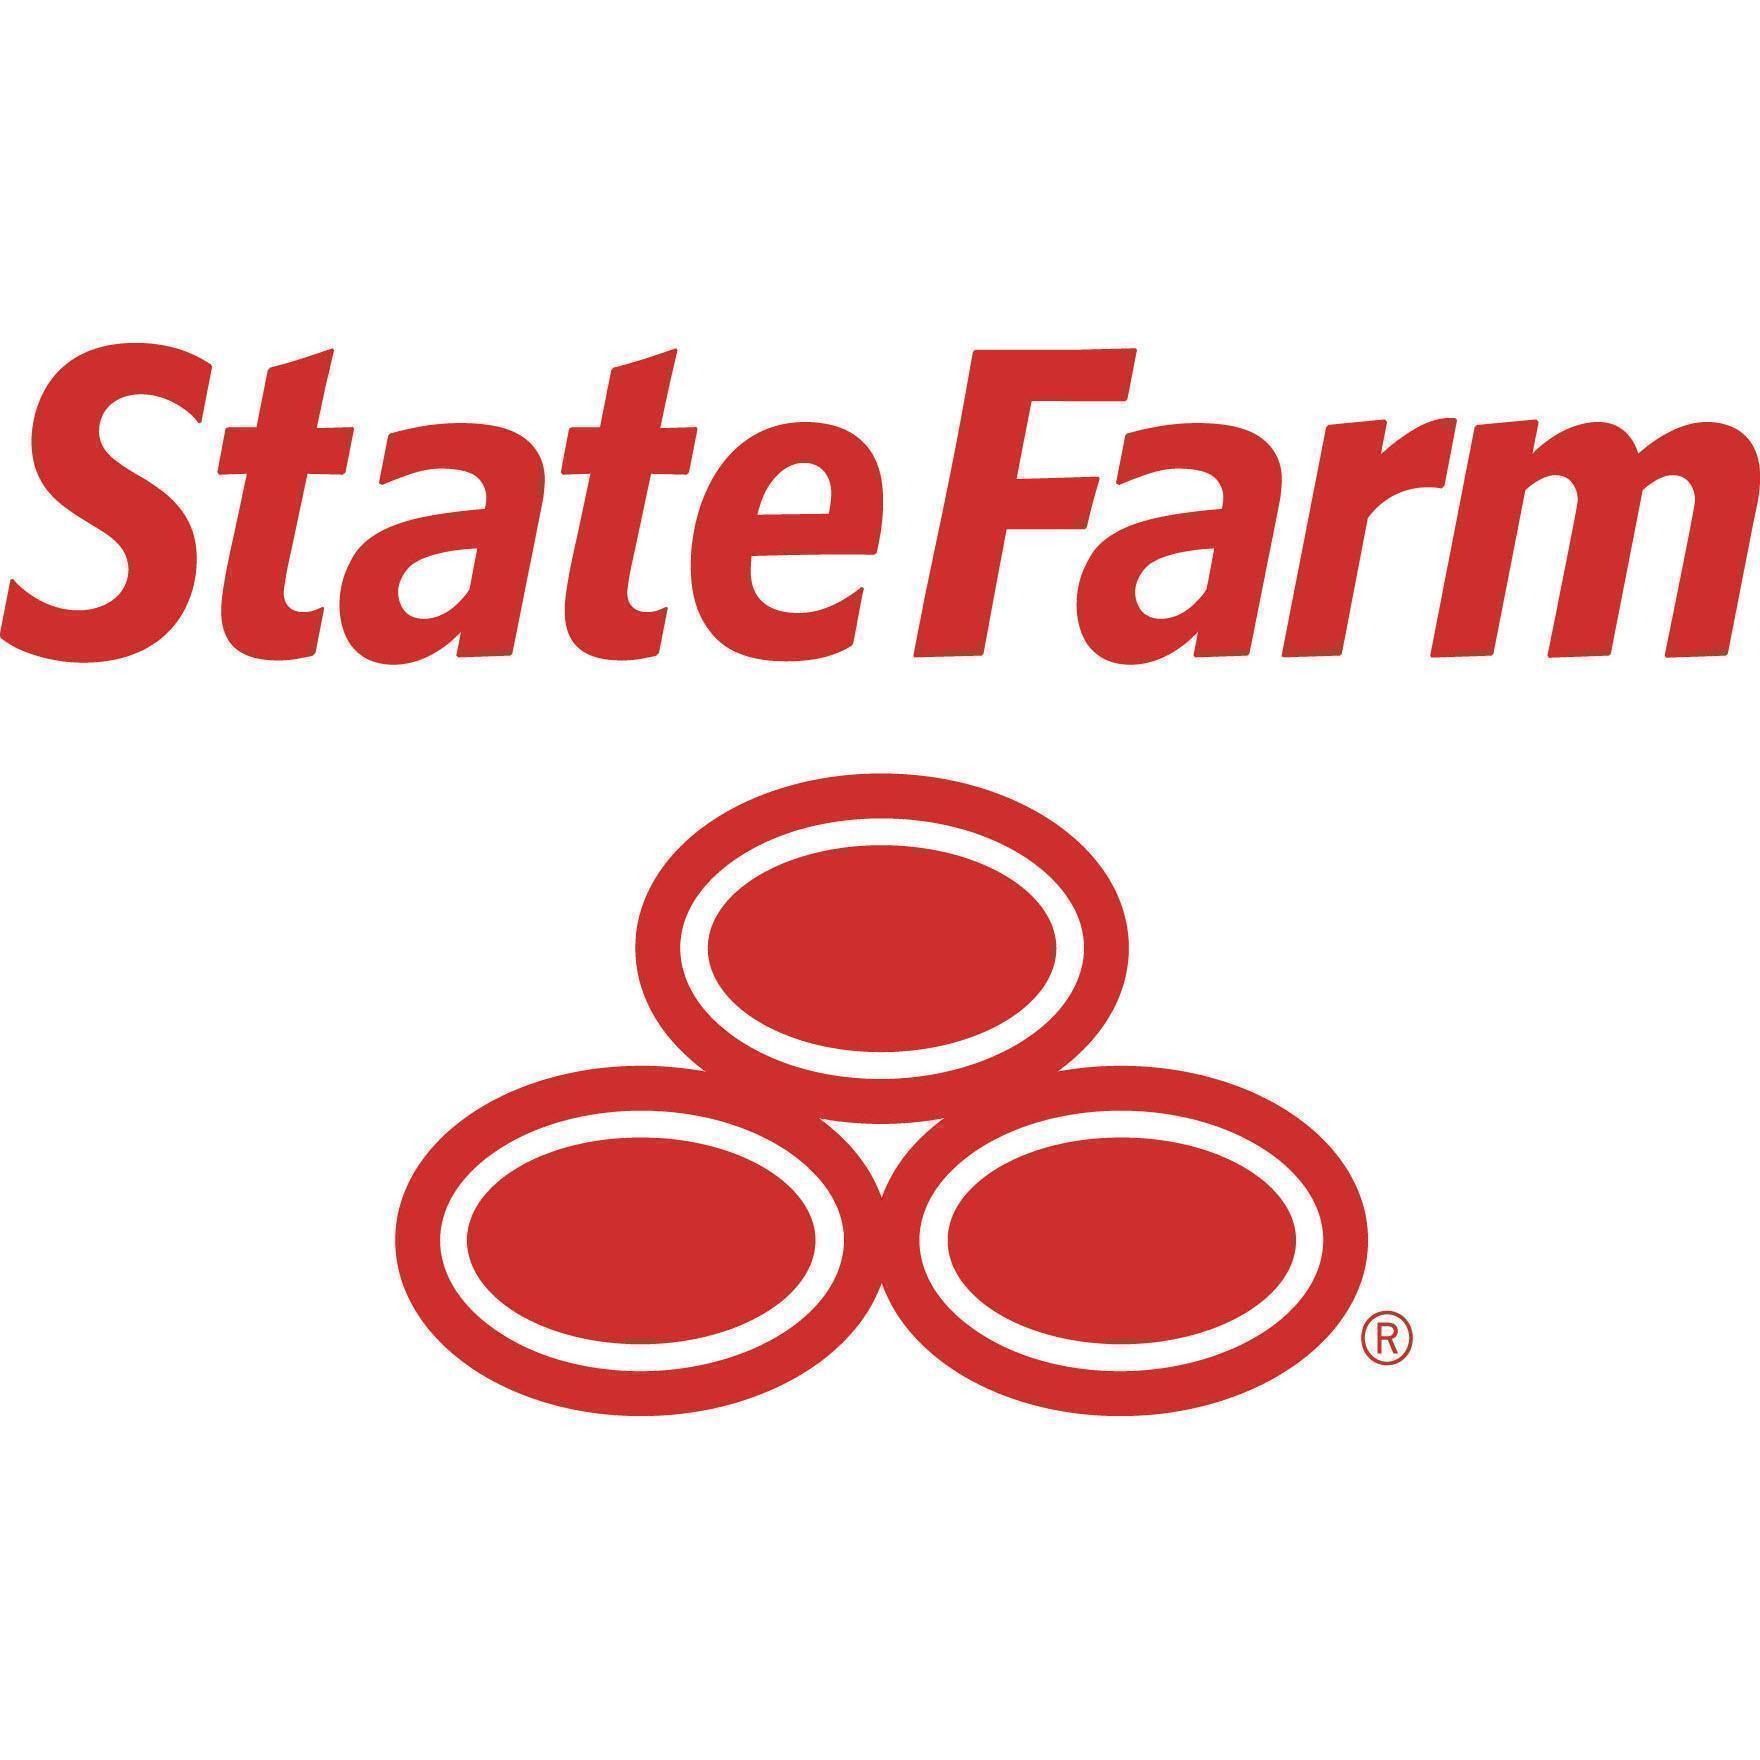 Jesus Granados - State Farm Insurance Agent